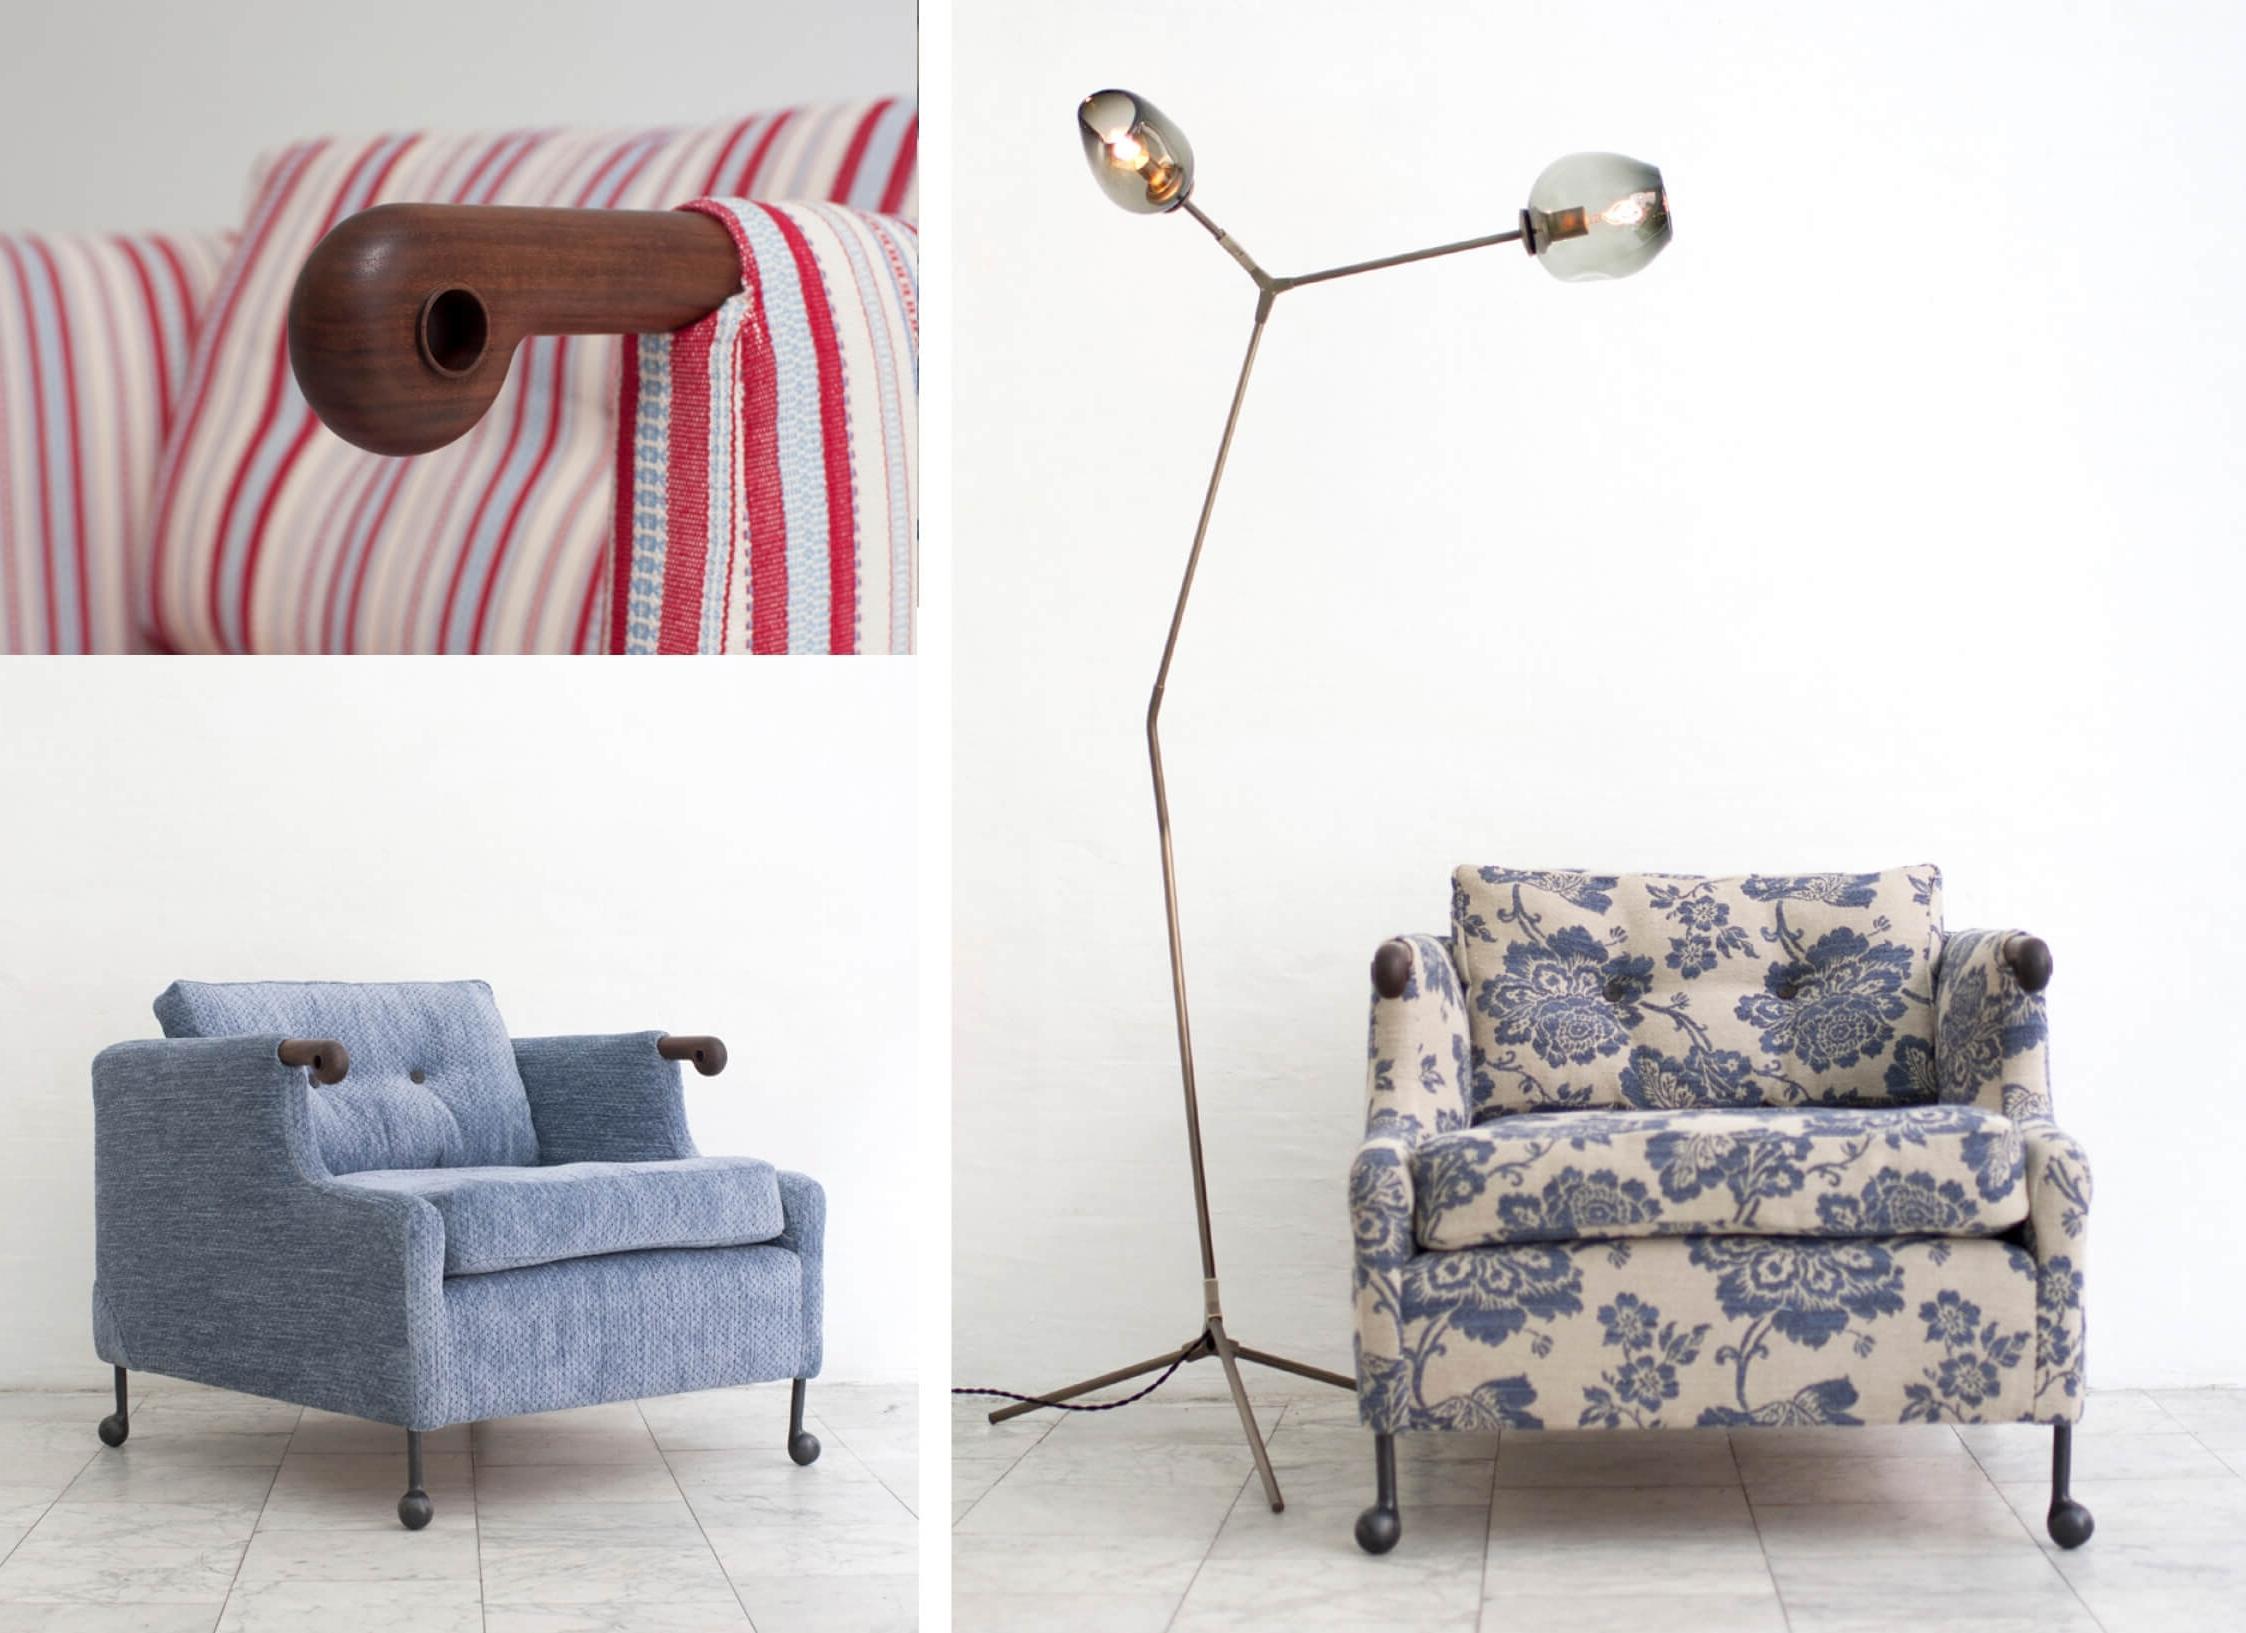 2018 Kijiji Kitchener Sectional Sofas Pertaining To Furniture : Kijiji Sofa Table Kitchener Roy Button Tufted (View 2 of 15)